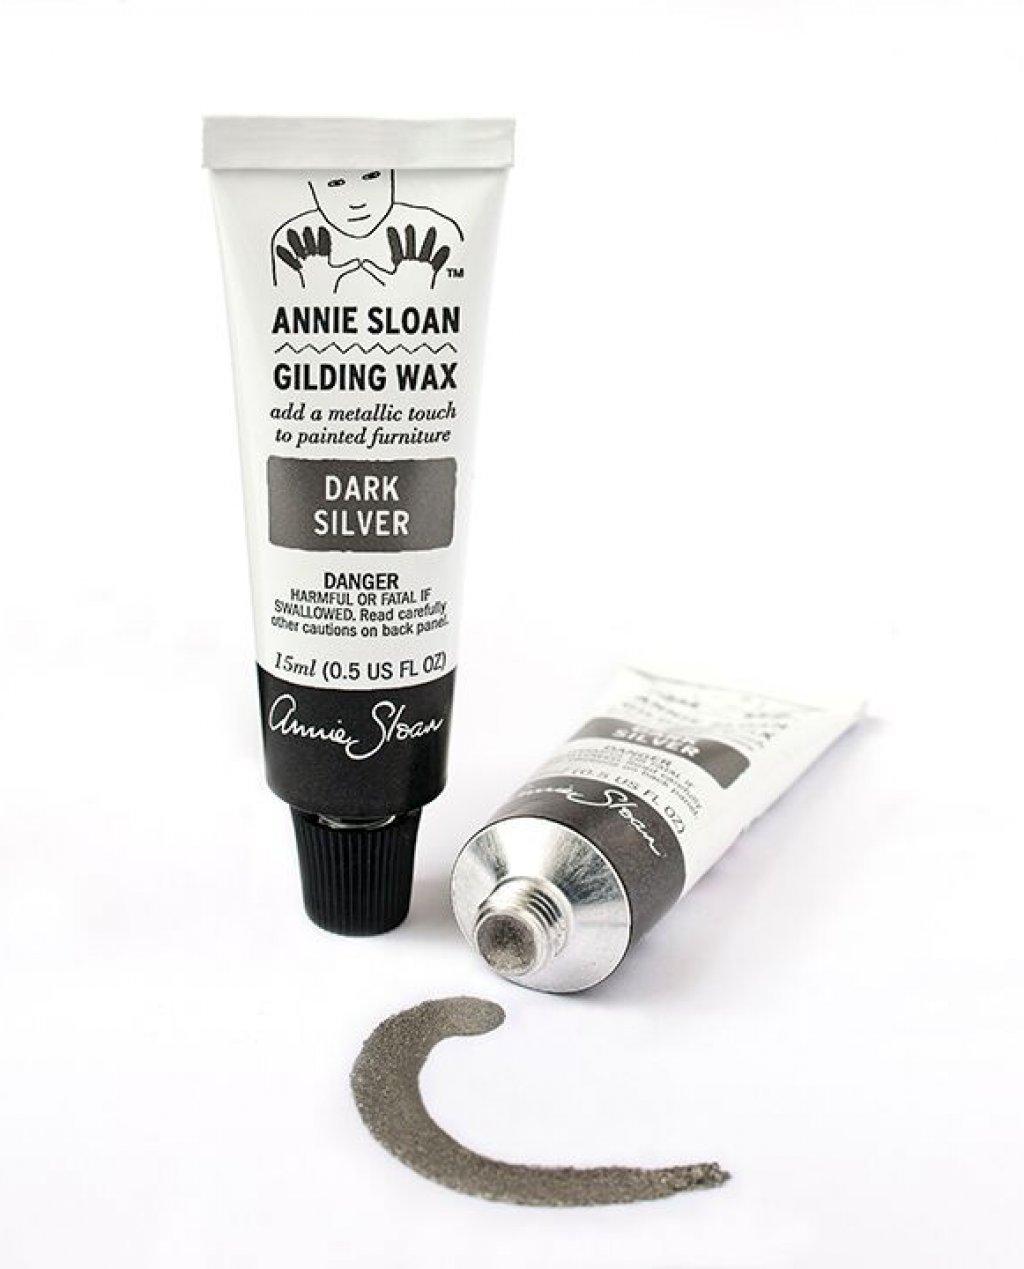 Annie Sloan Gilding Wax - Dark Silver